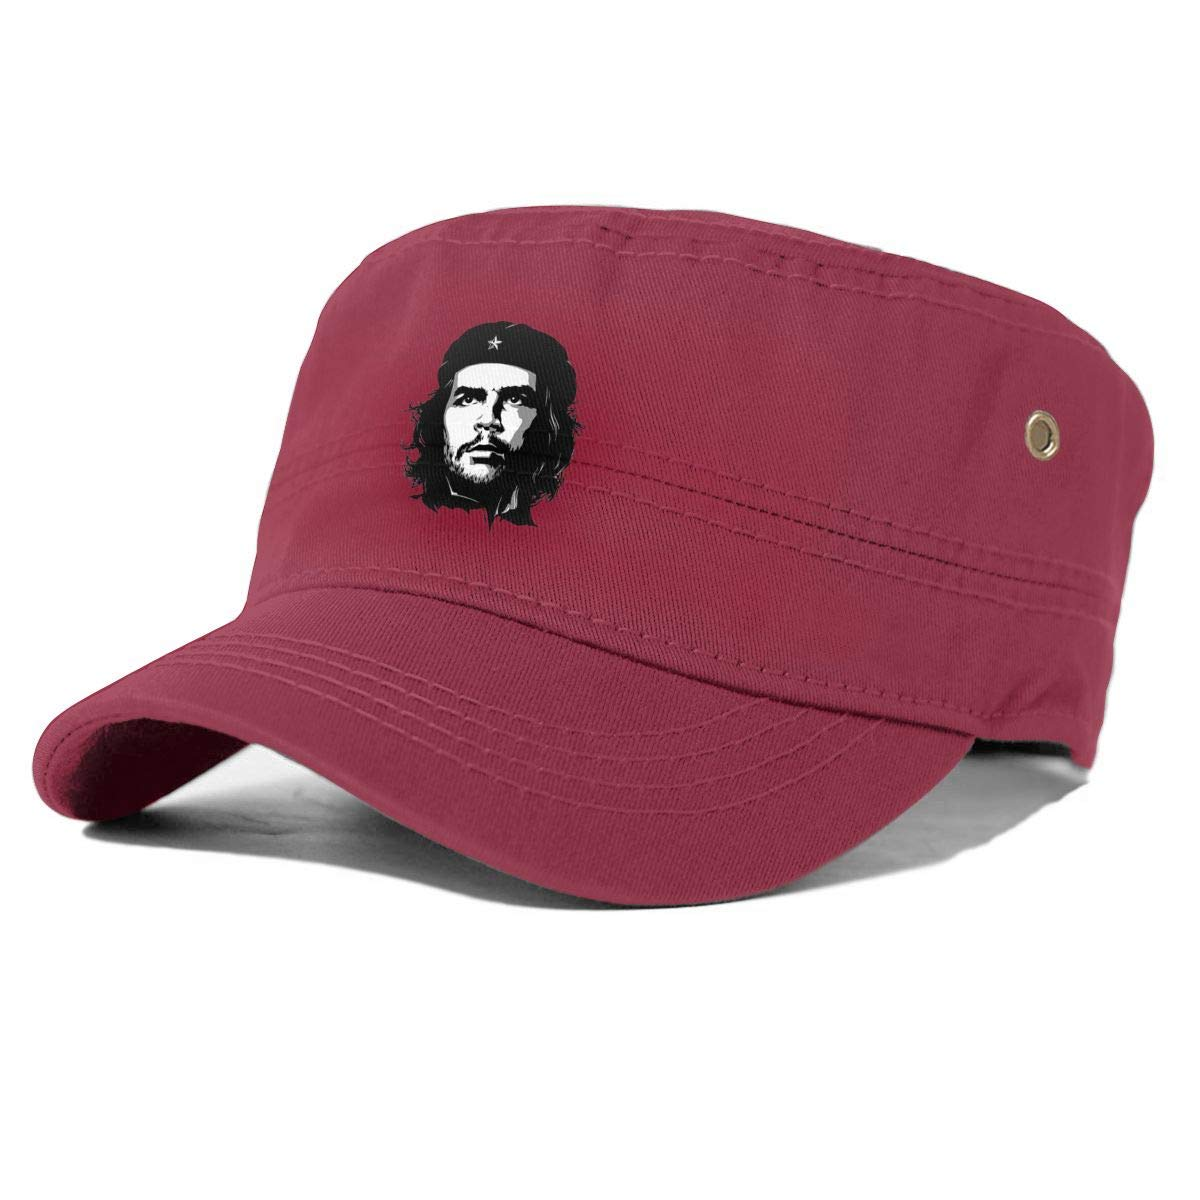 SKTTO Che Guevara Cadet Army - Gorra de Estilo Militar para Uso ...